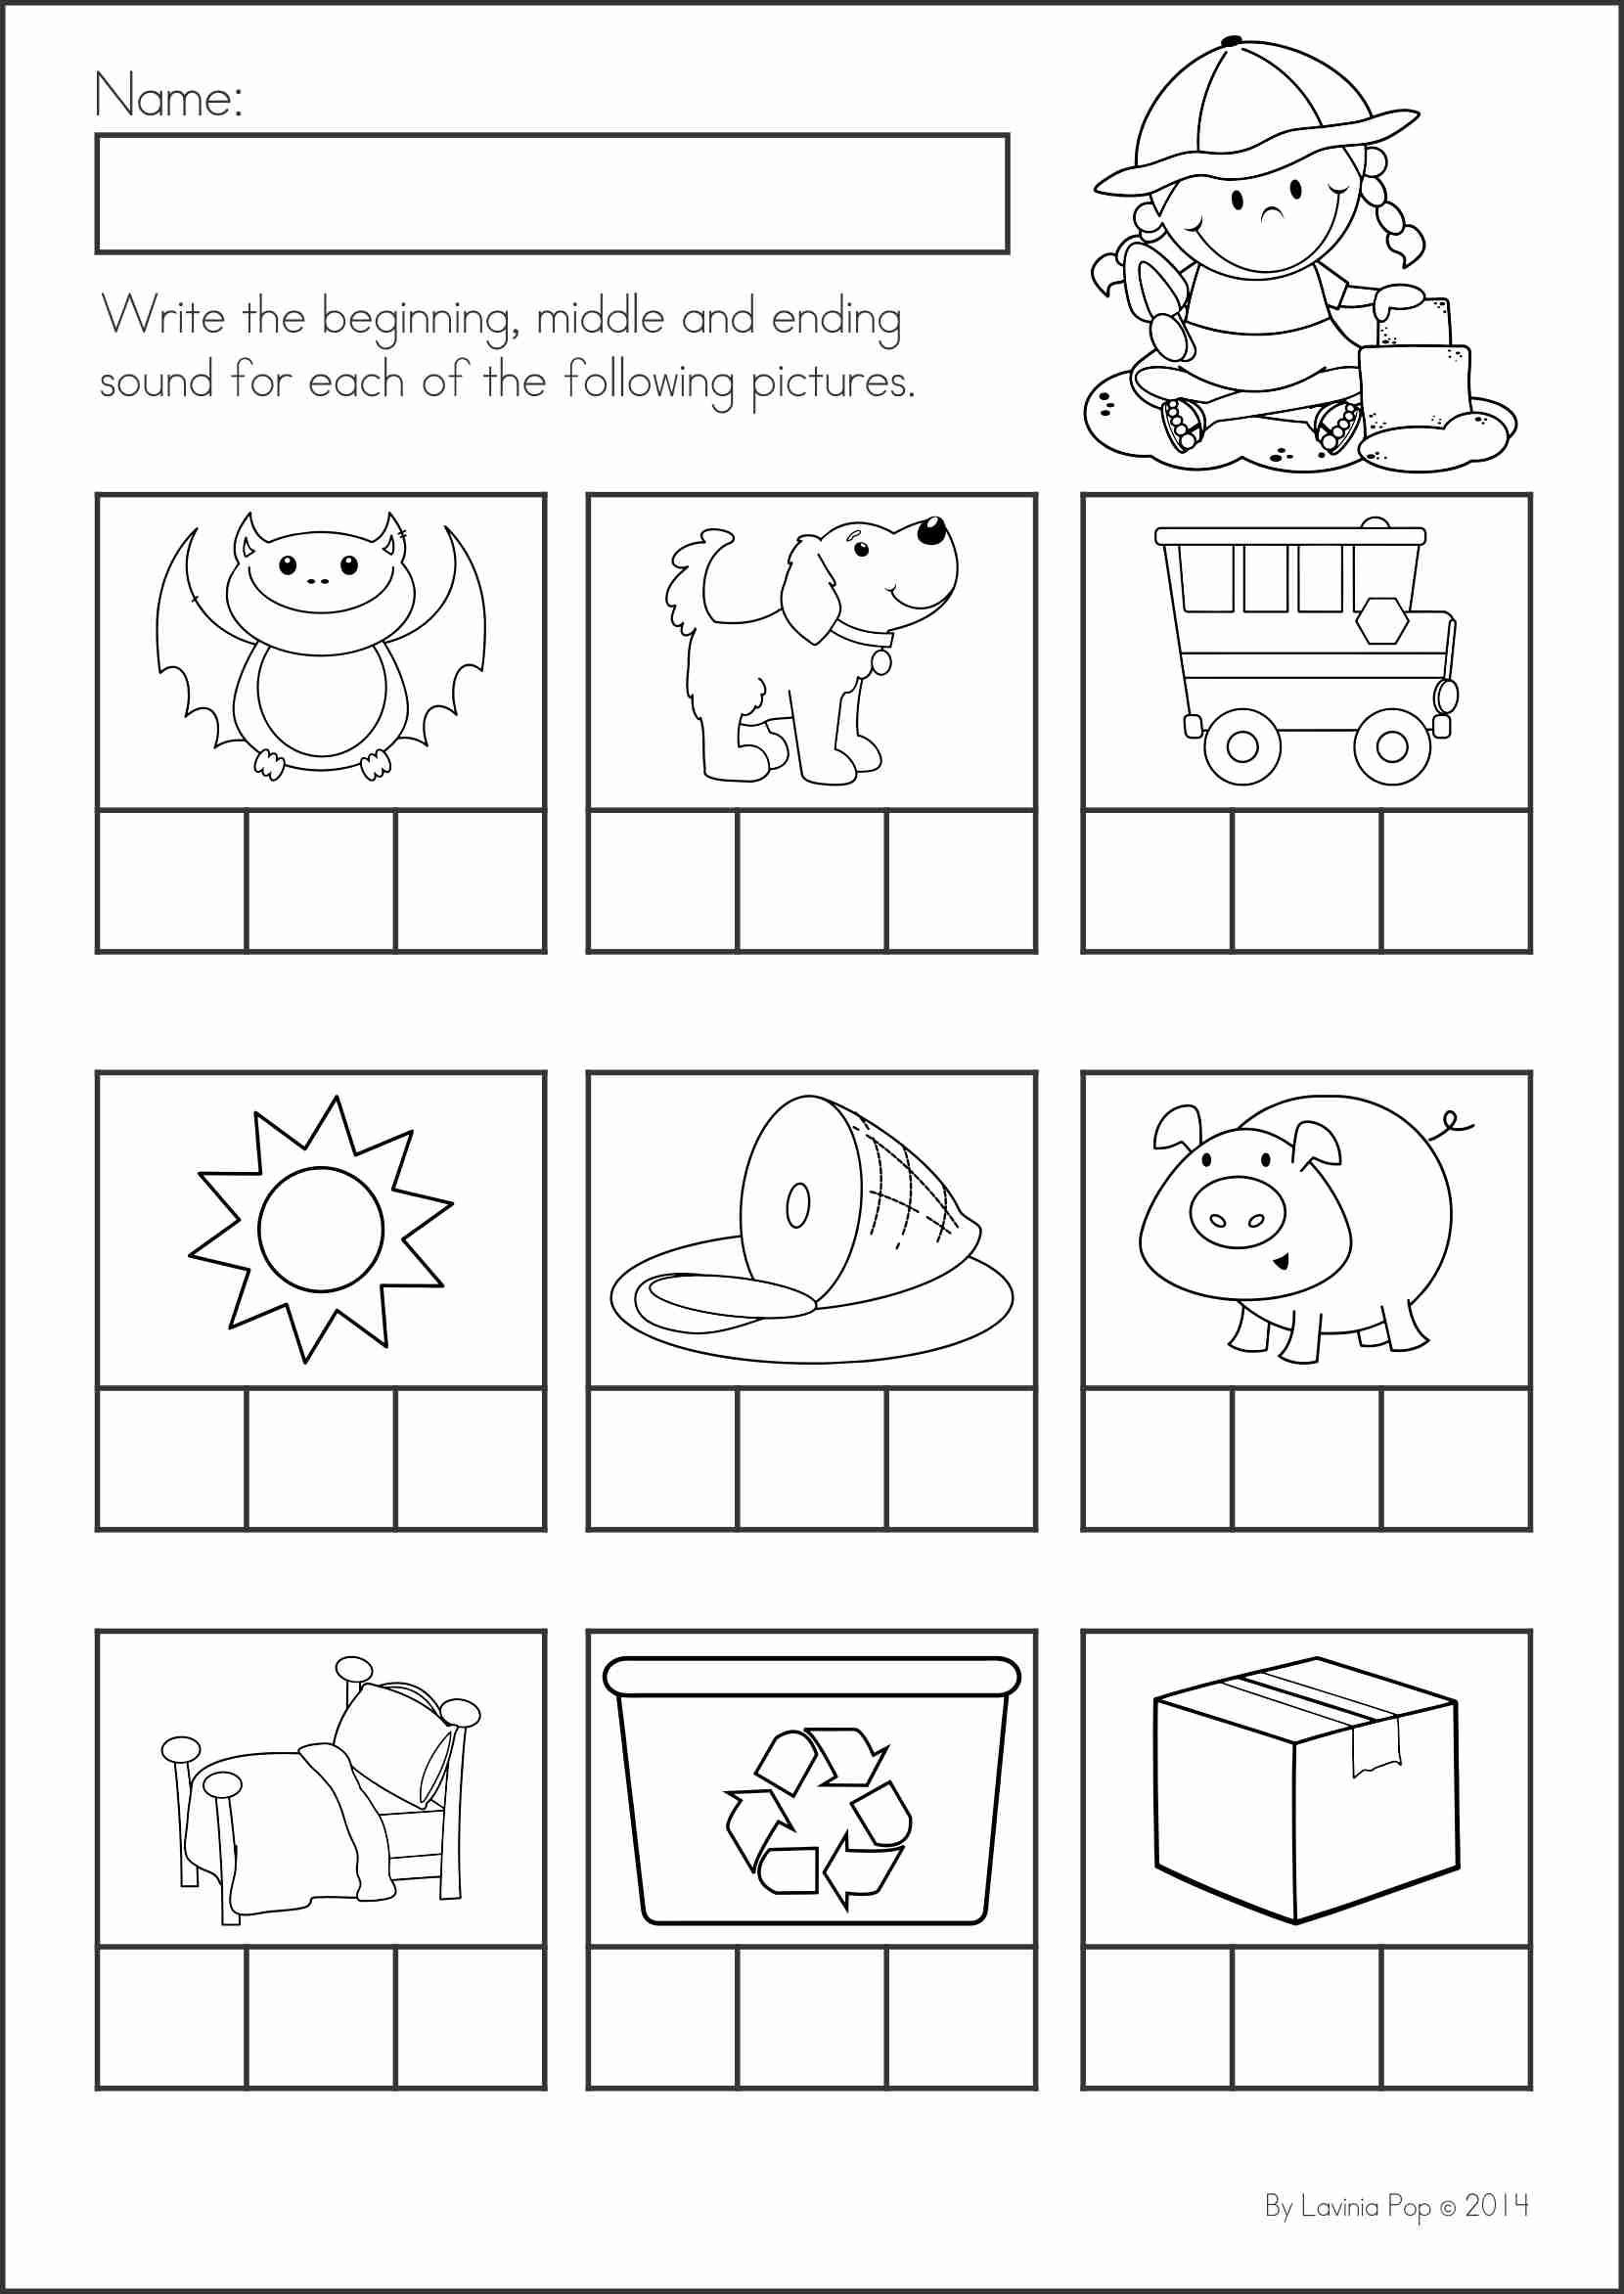 Cvc Worksheets Kindergarten Free Unique Writing Cvc Words Worksheet